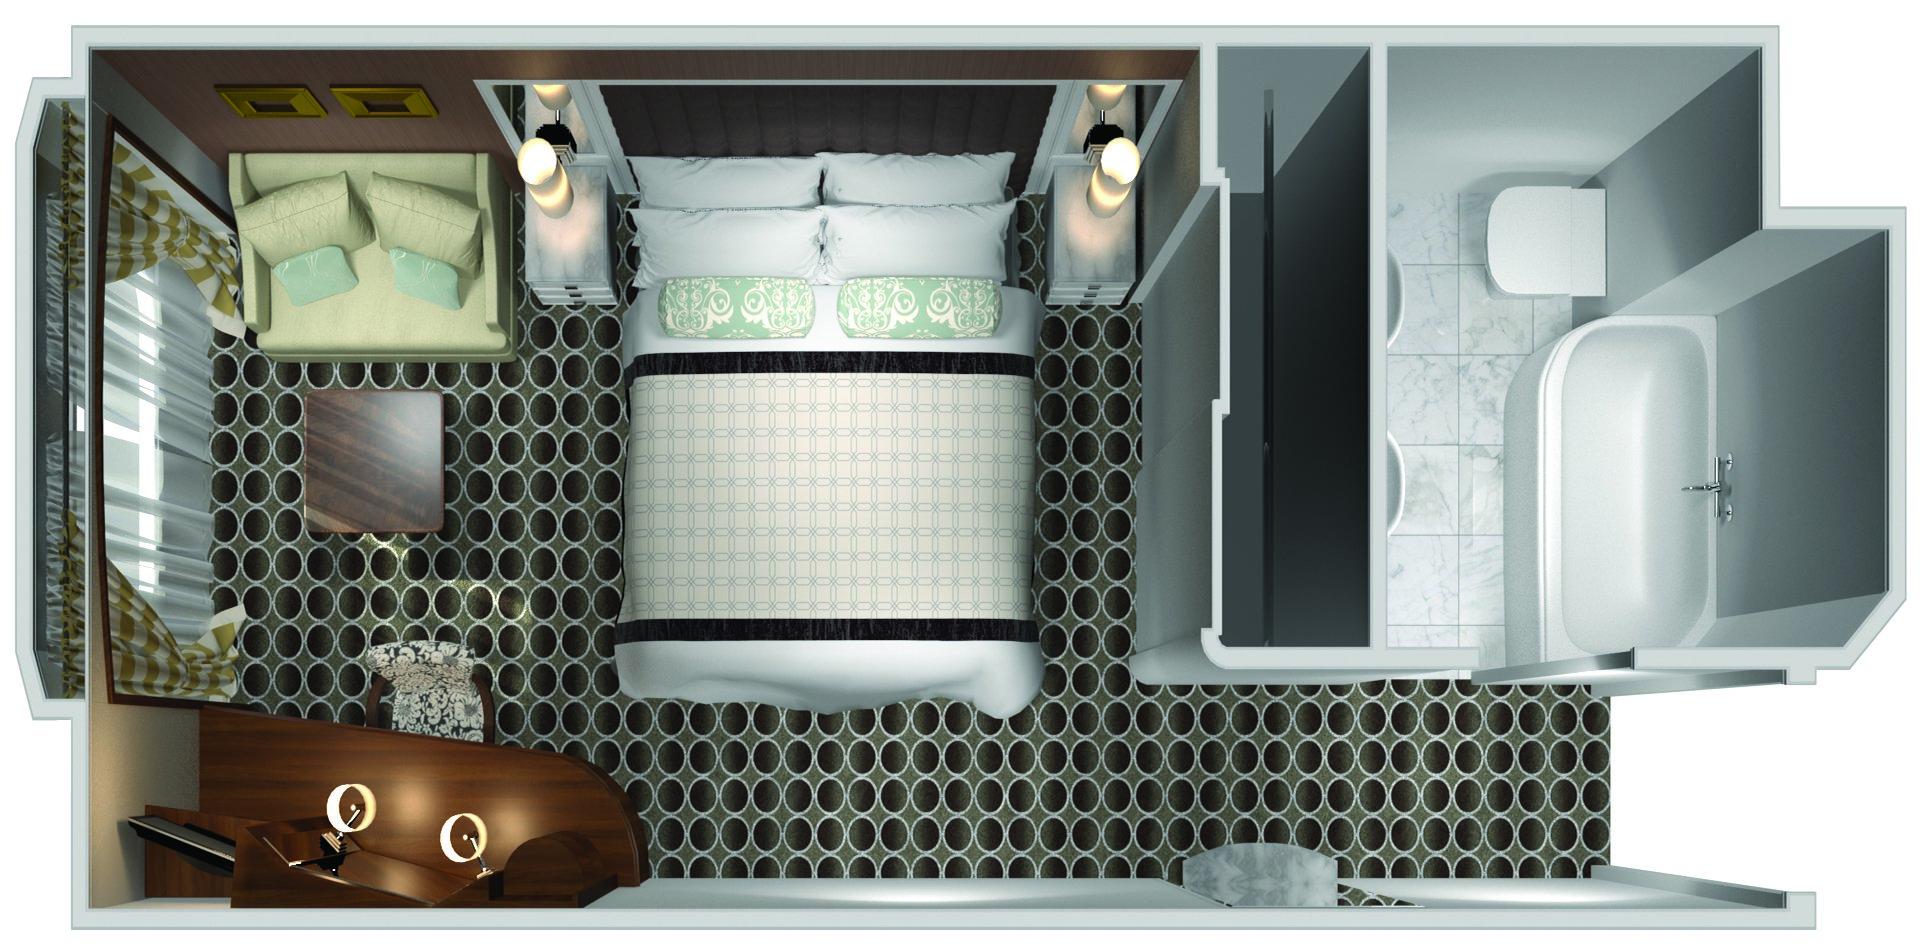 Deluxe Kabine mit Panoramafenster - Crystal Serenity - Deluxe Kabine mit Panoramafenster C1 / C2 / C3 - Crystal Serenity - Bild 3 - Grundriss Thumb